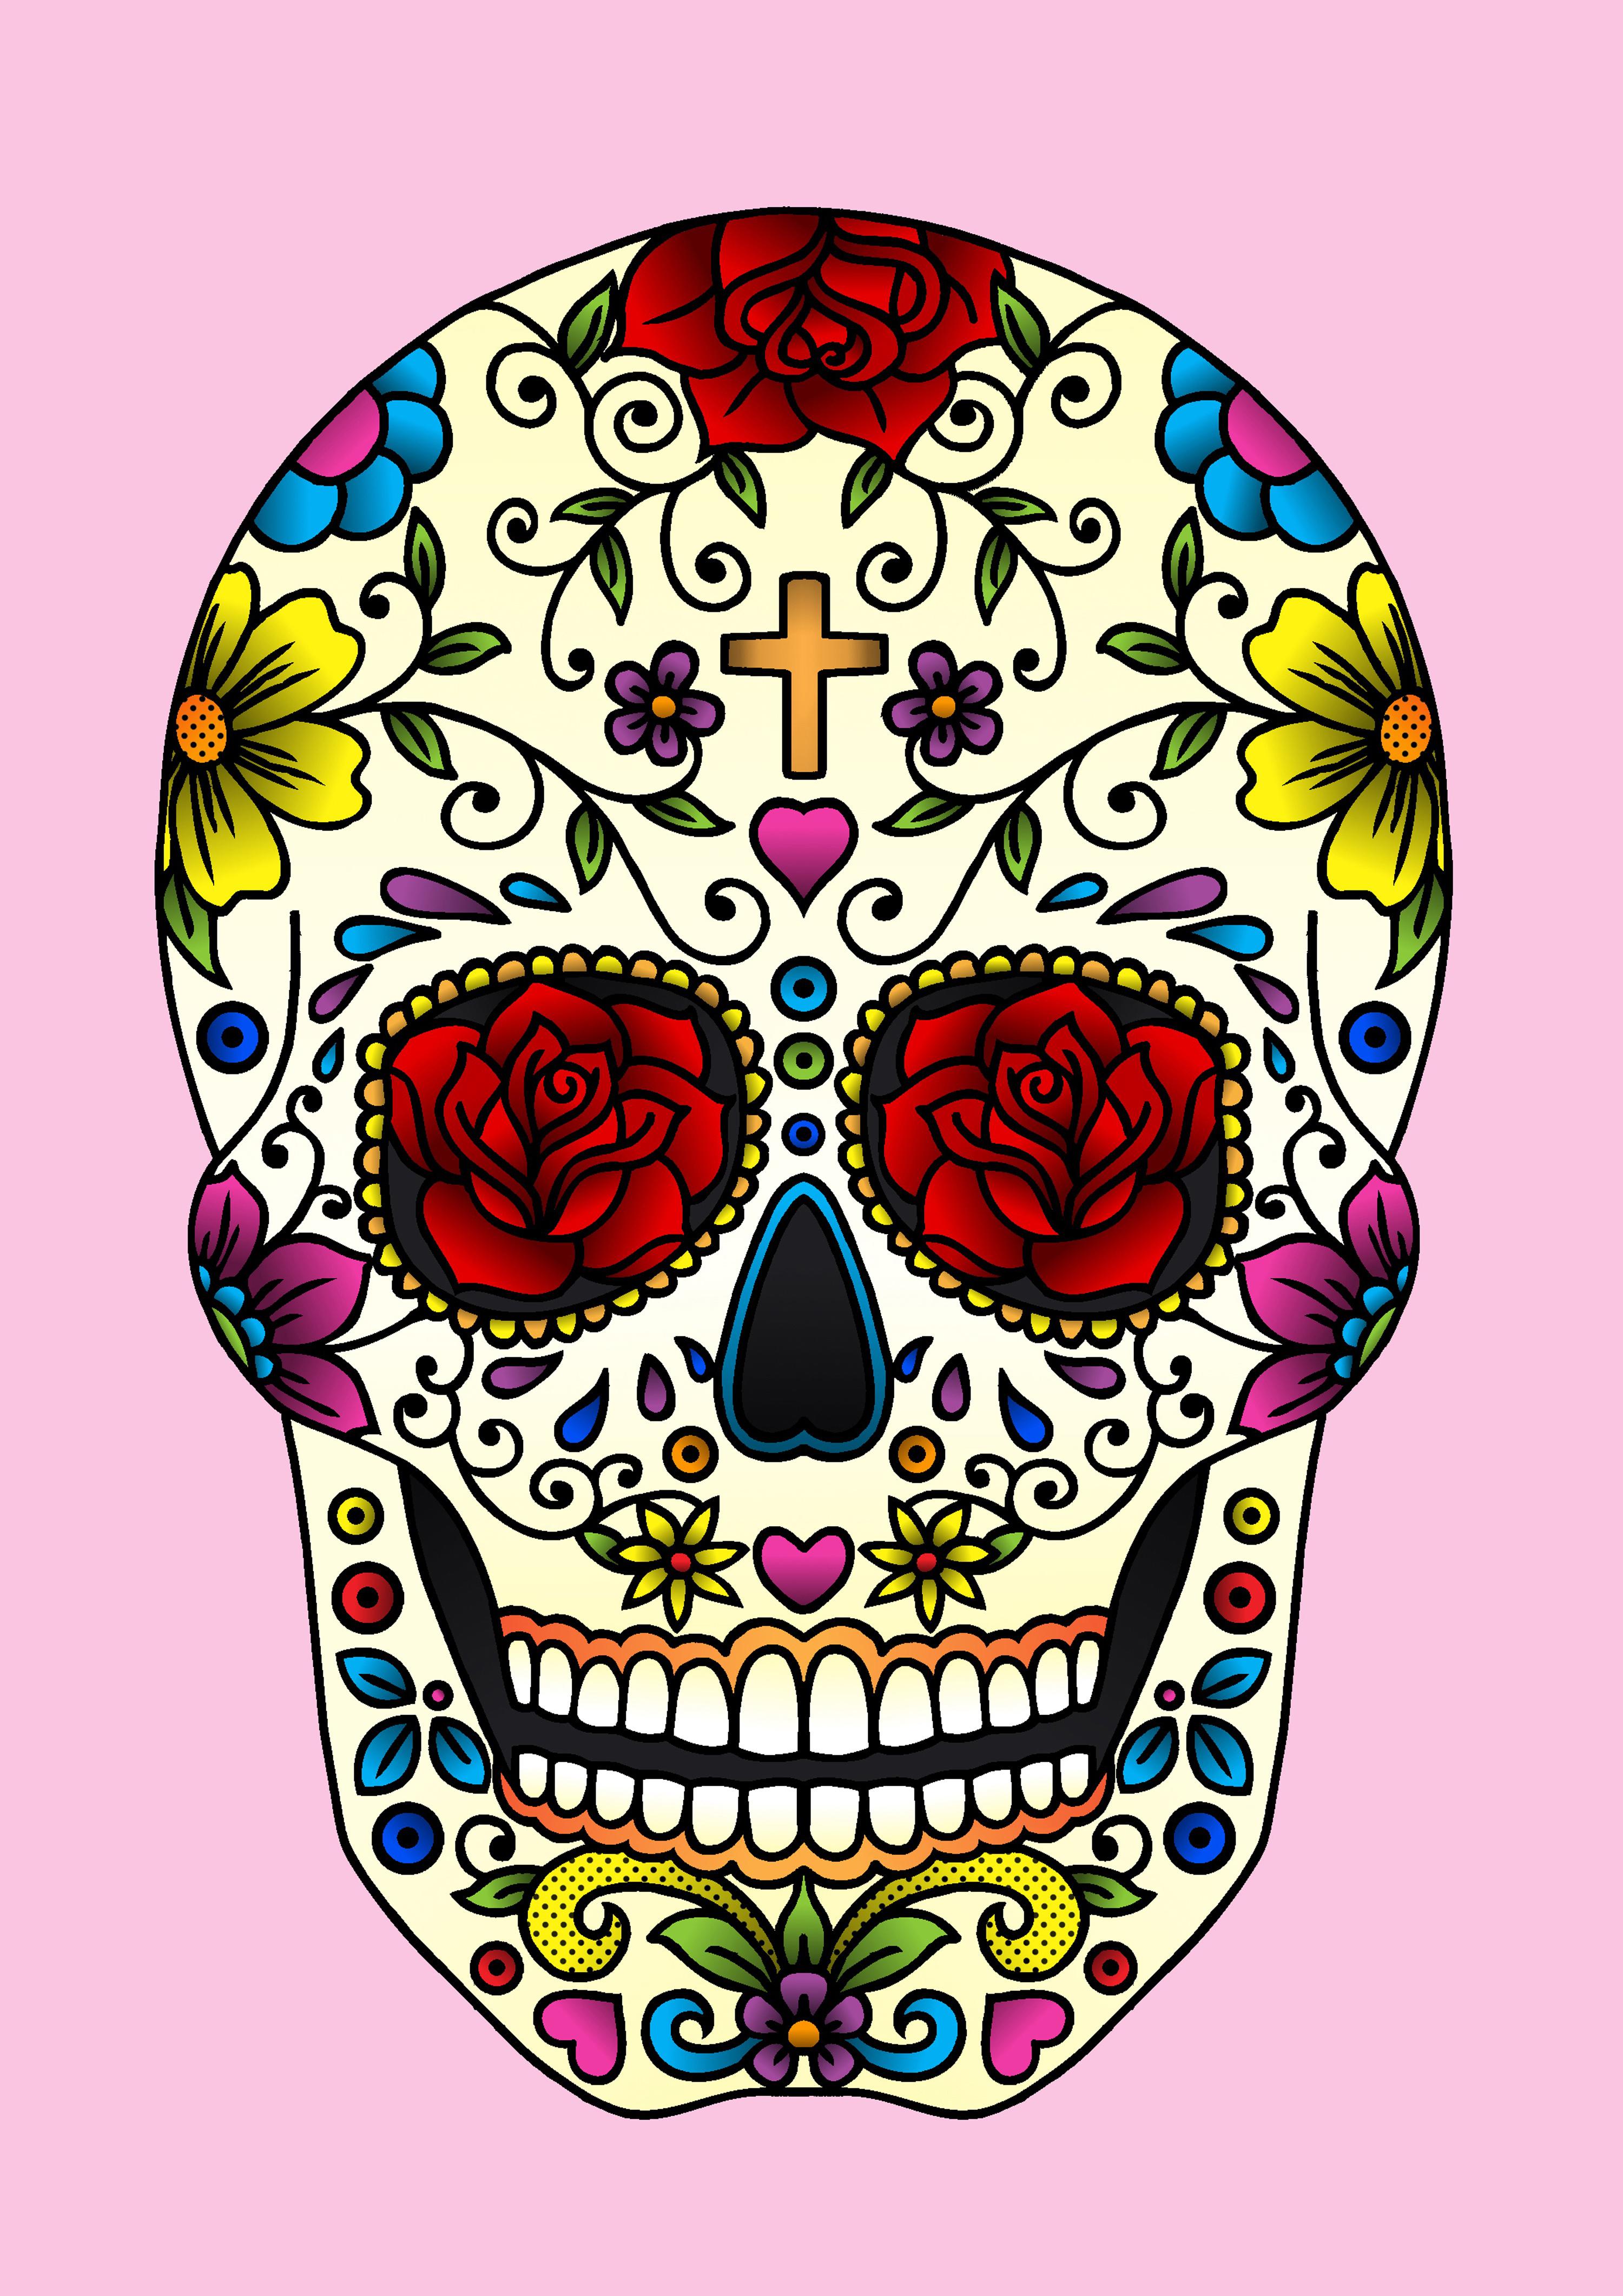 sugar skull » jadeboylan on JuicyCanvas.com